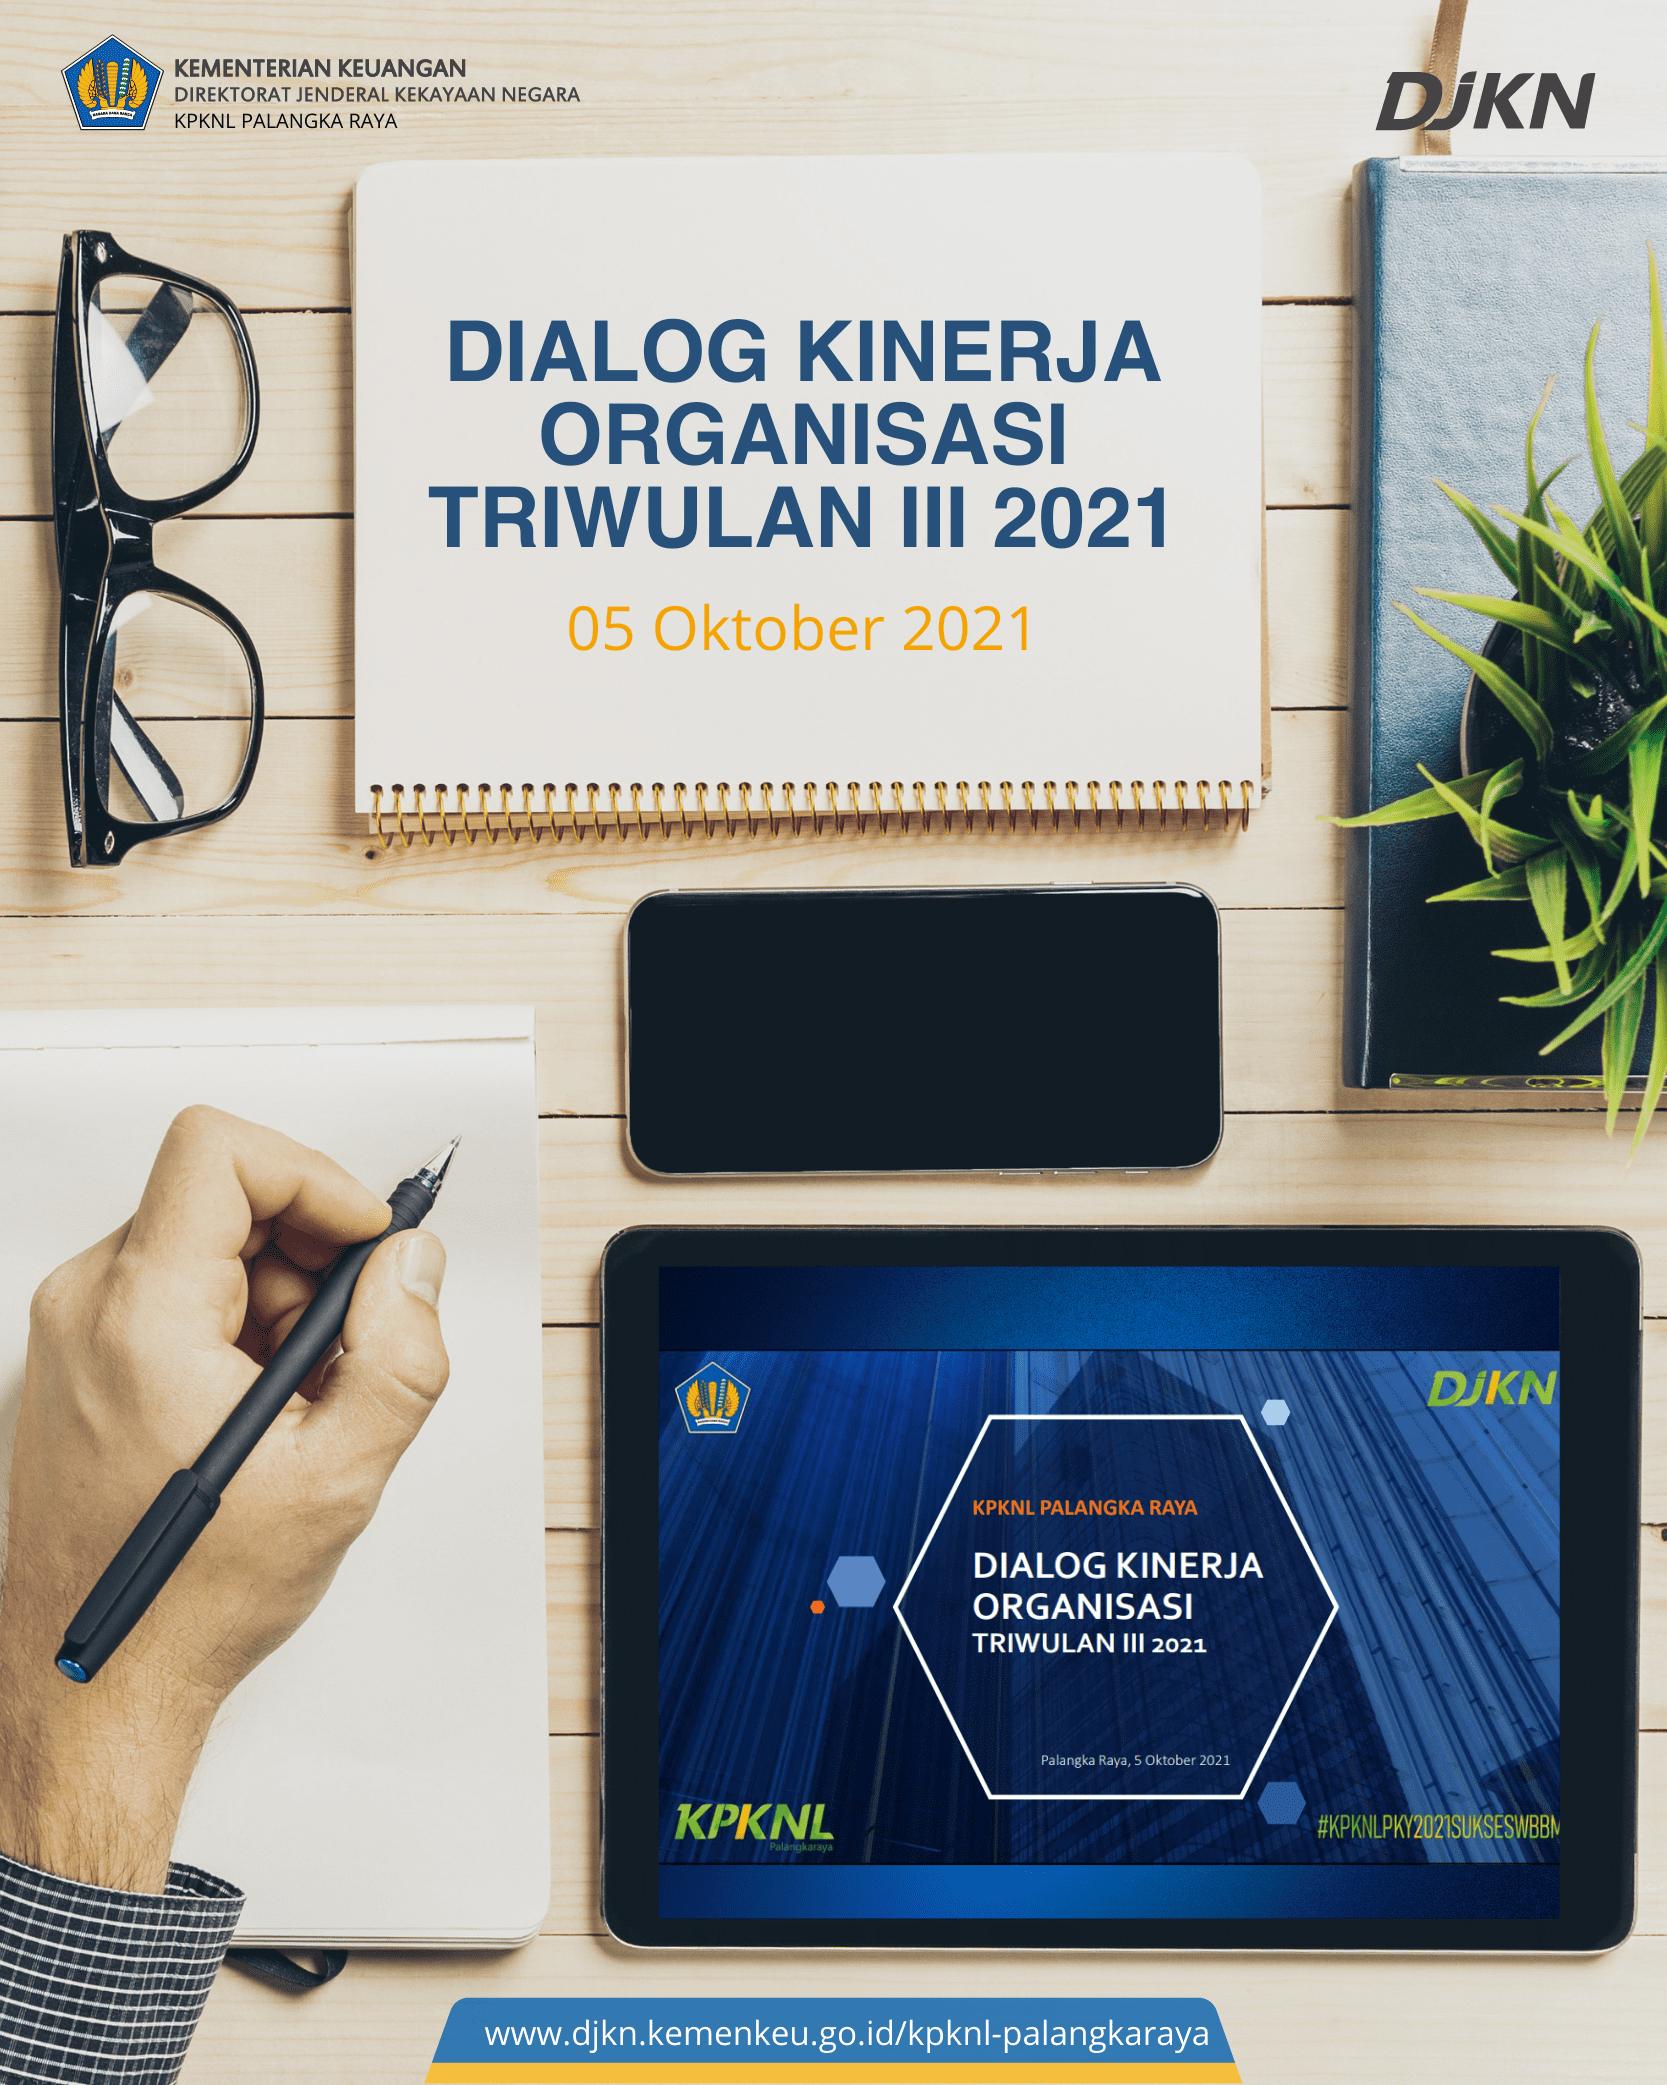 Dialog Kinerja Organisasi Triwulan III Tahun 2021 KPKNL Palangka Raya